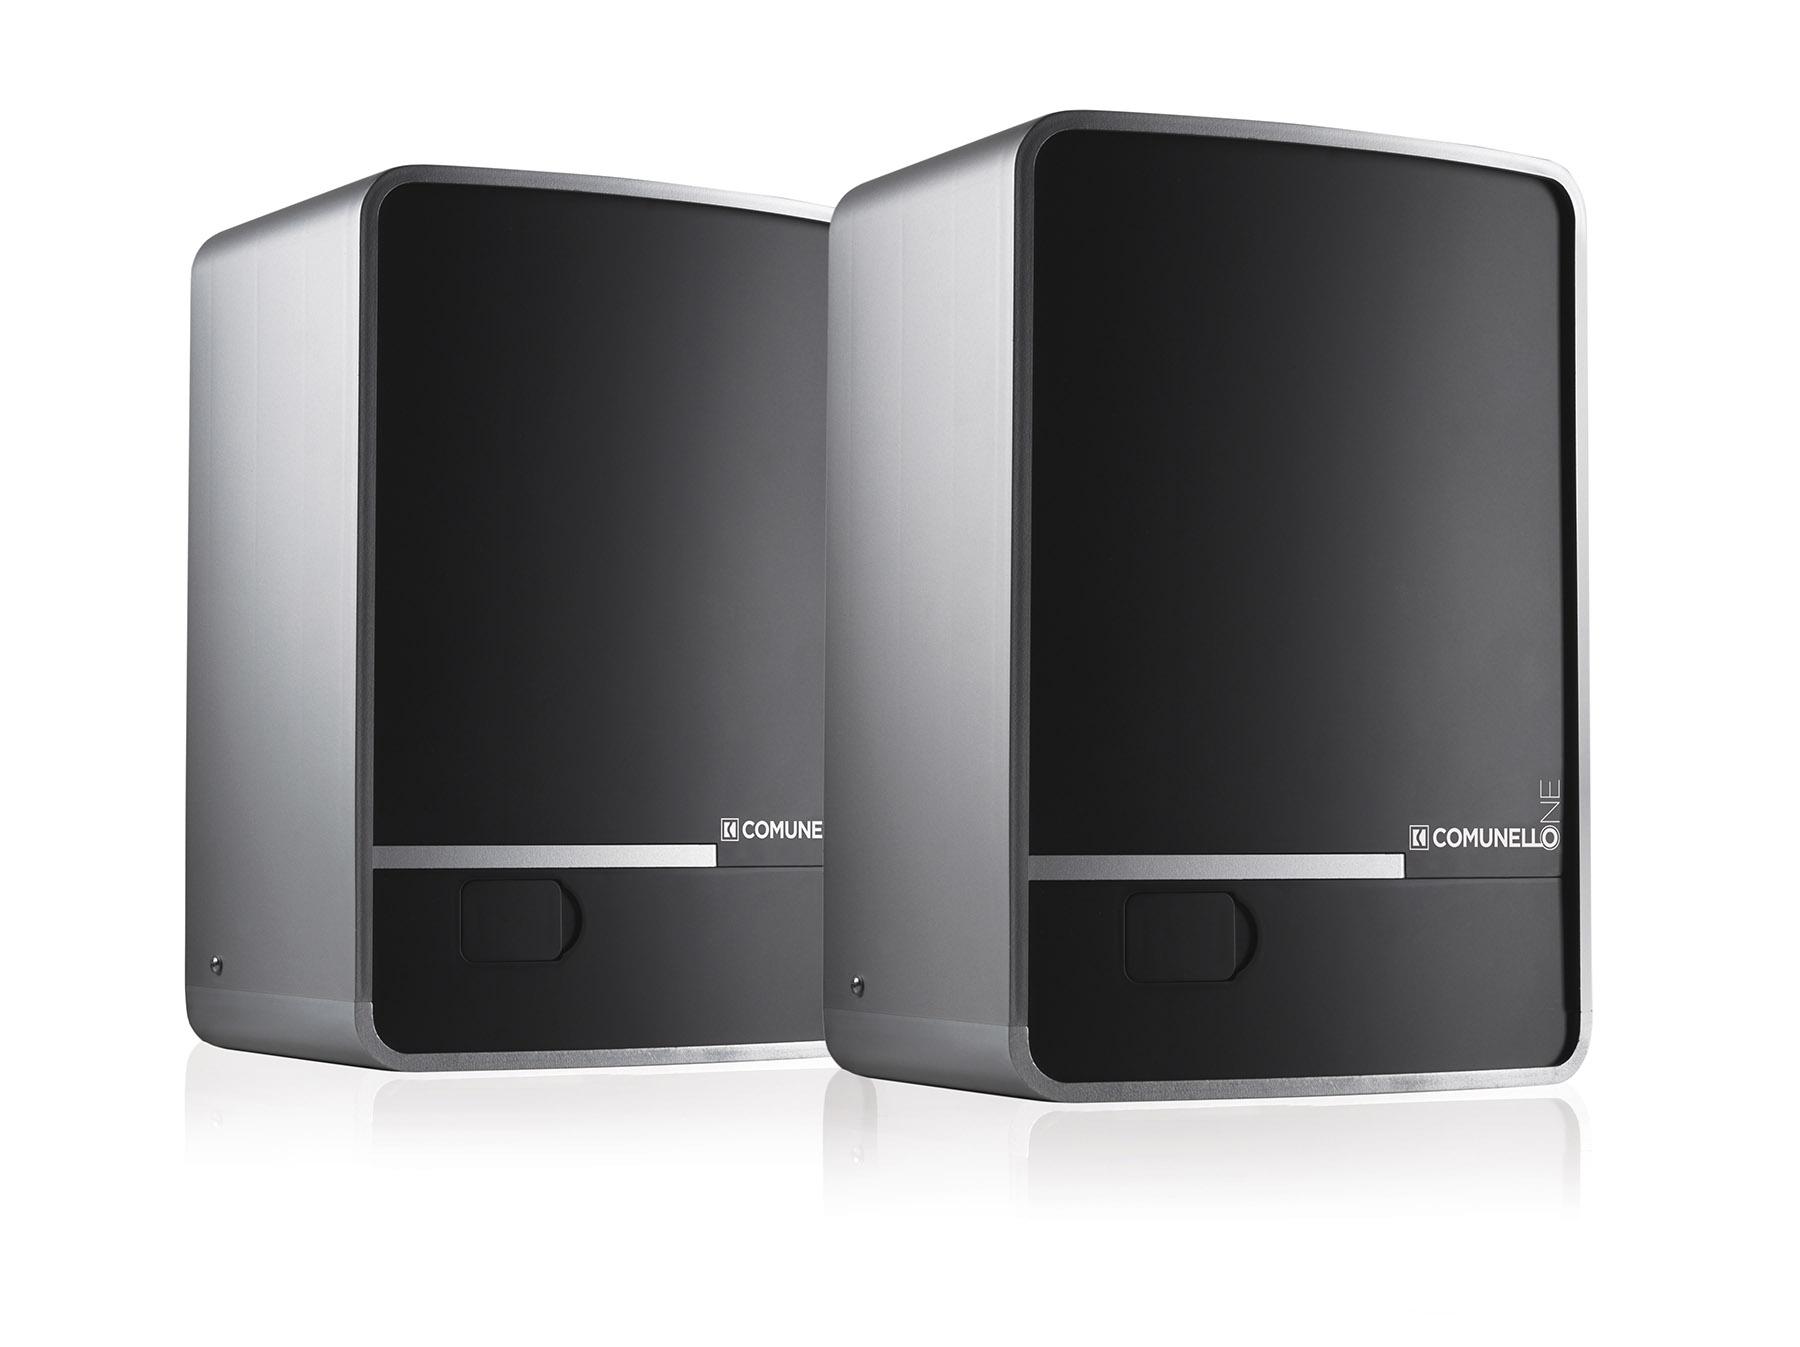 fratelli comunello automation scheda prodotto kit fort 600 one dual. Black Bedroom Furniture Sets. Home Design Ideas